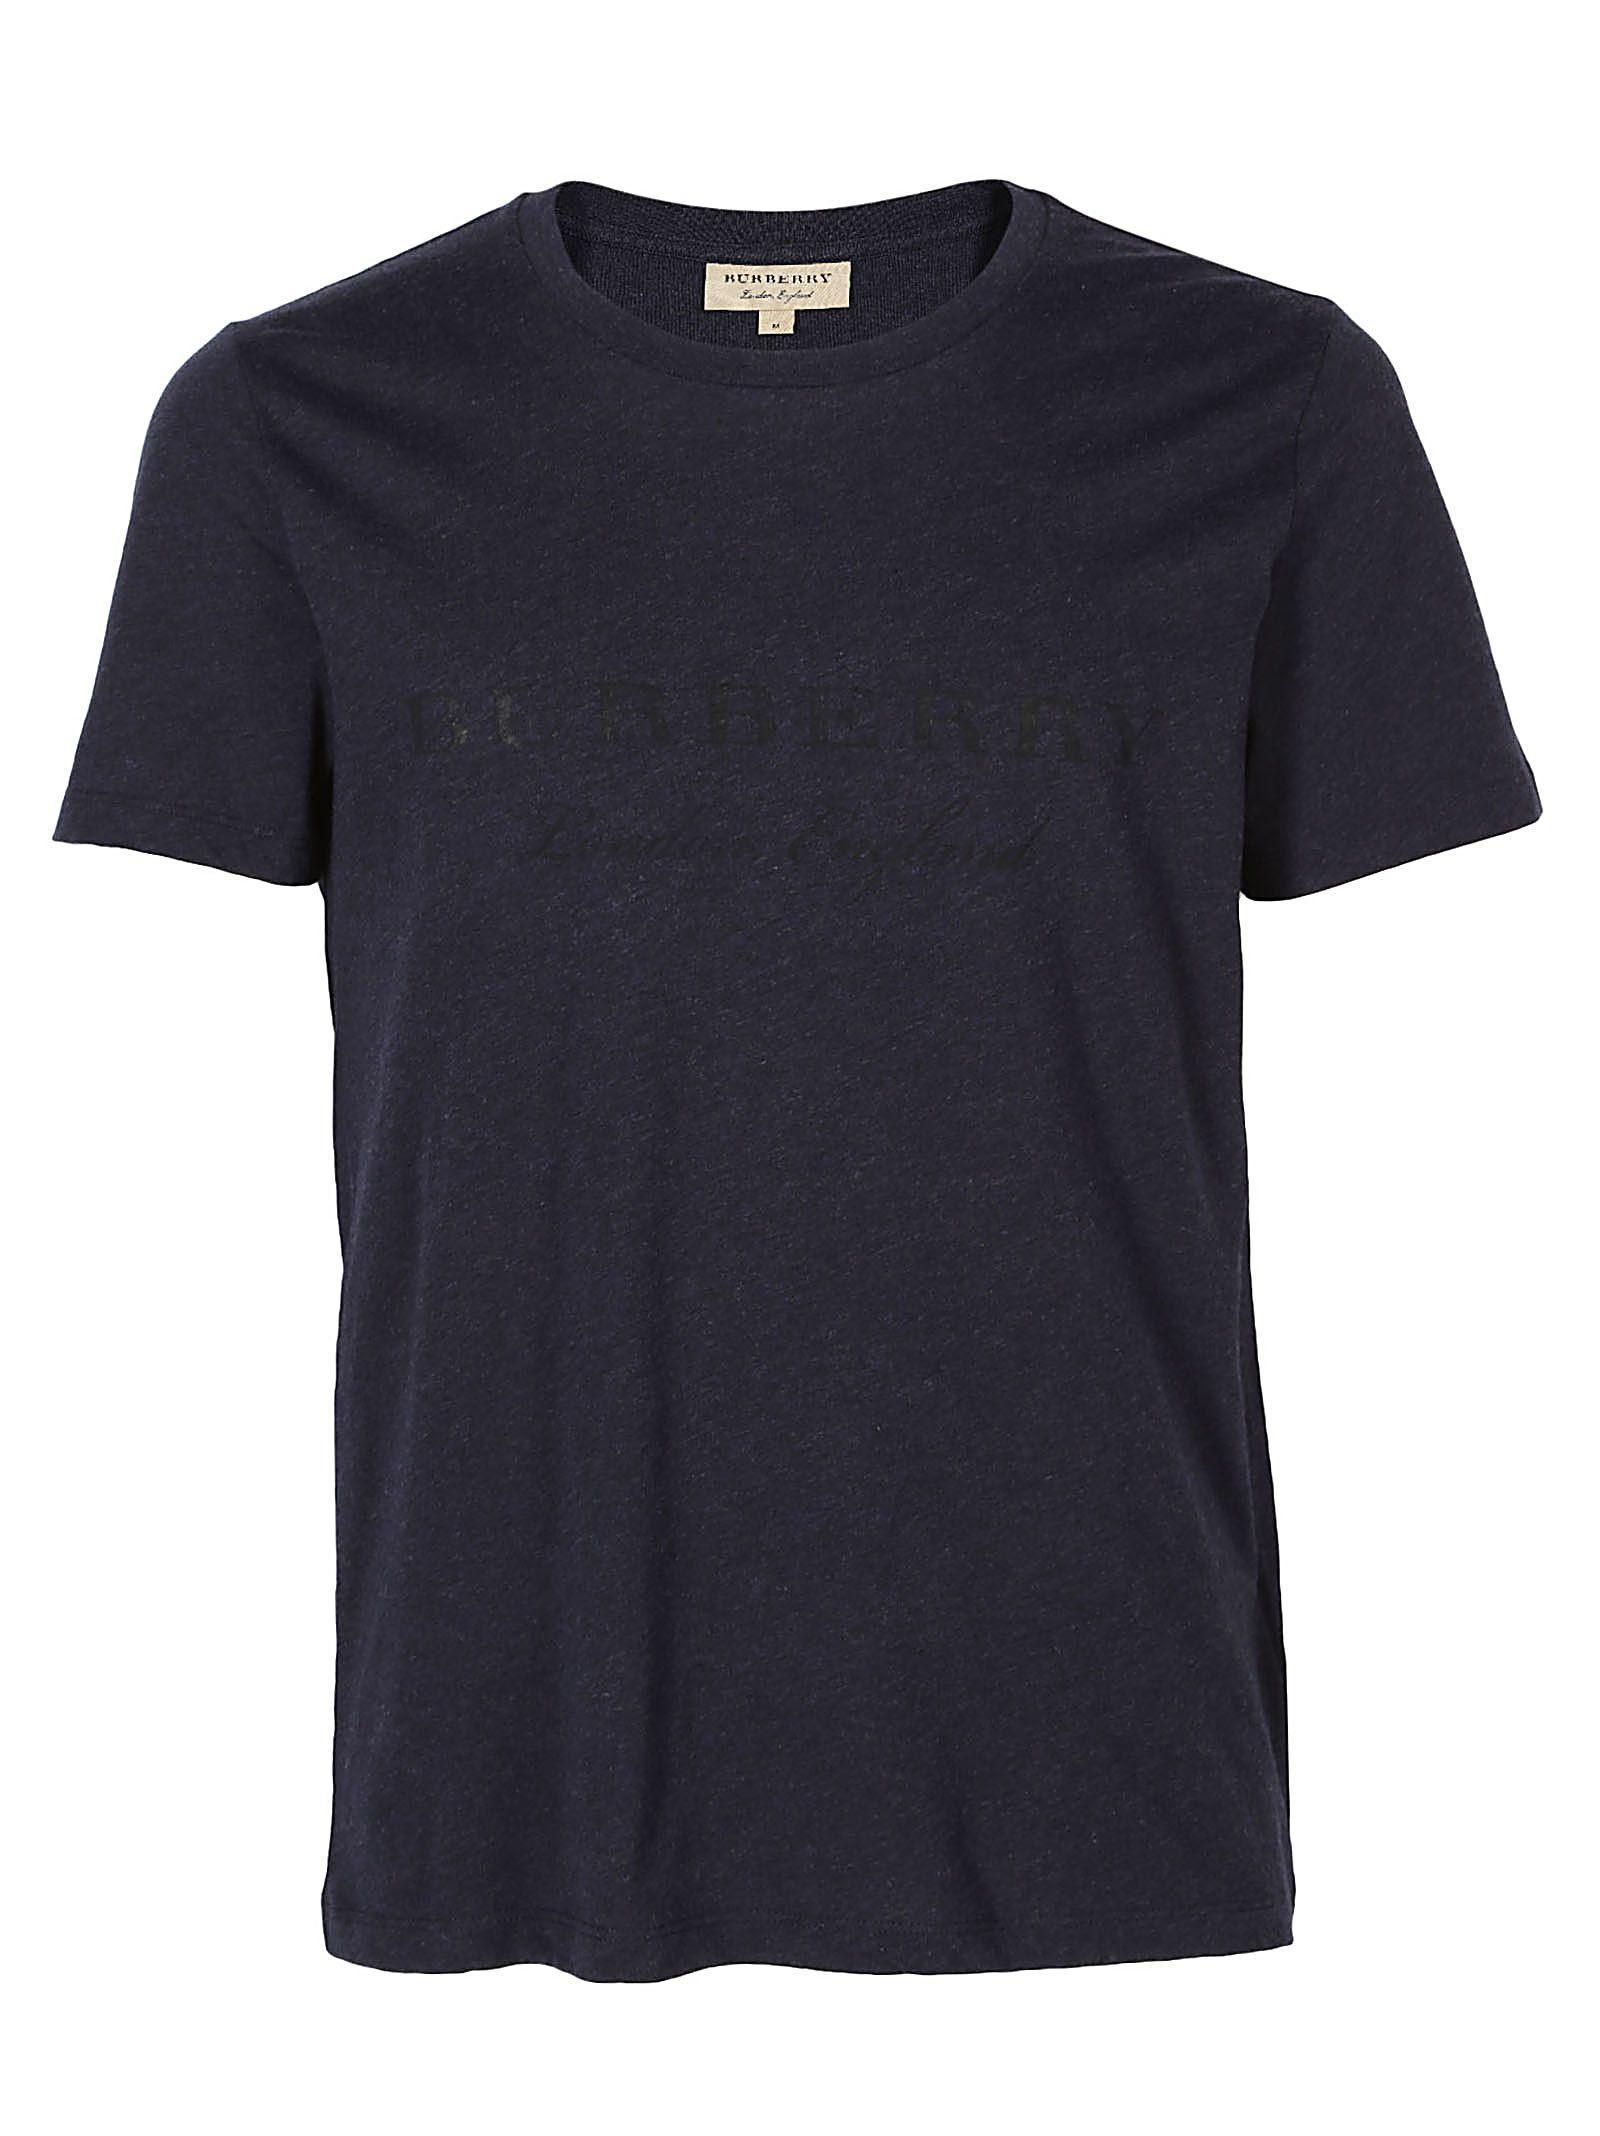 Burberry T-shirt In Navy Melange